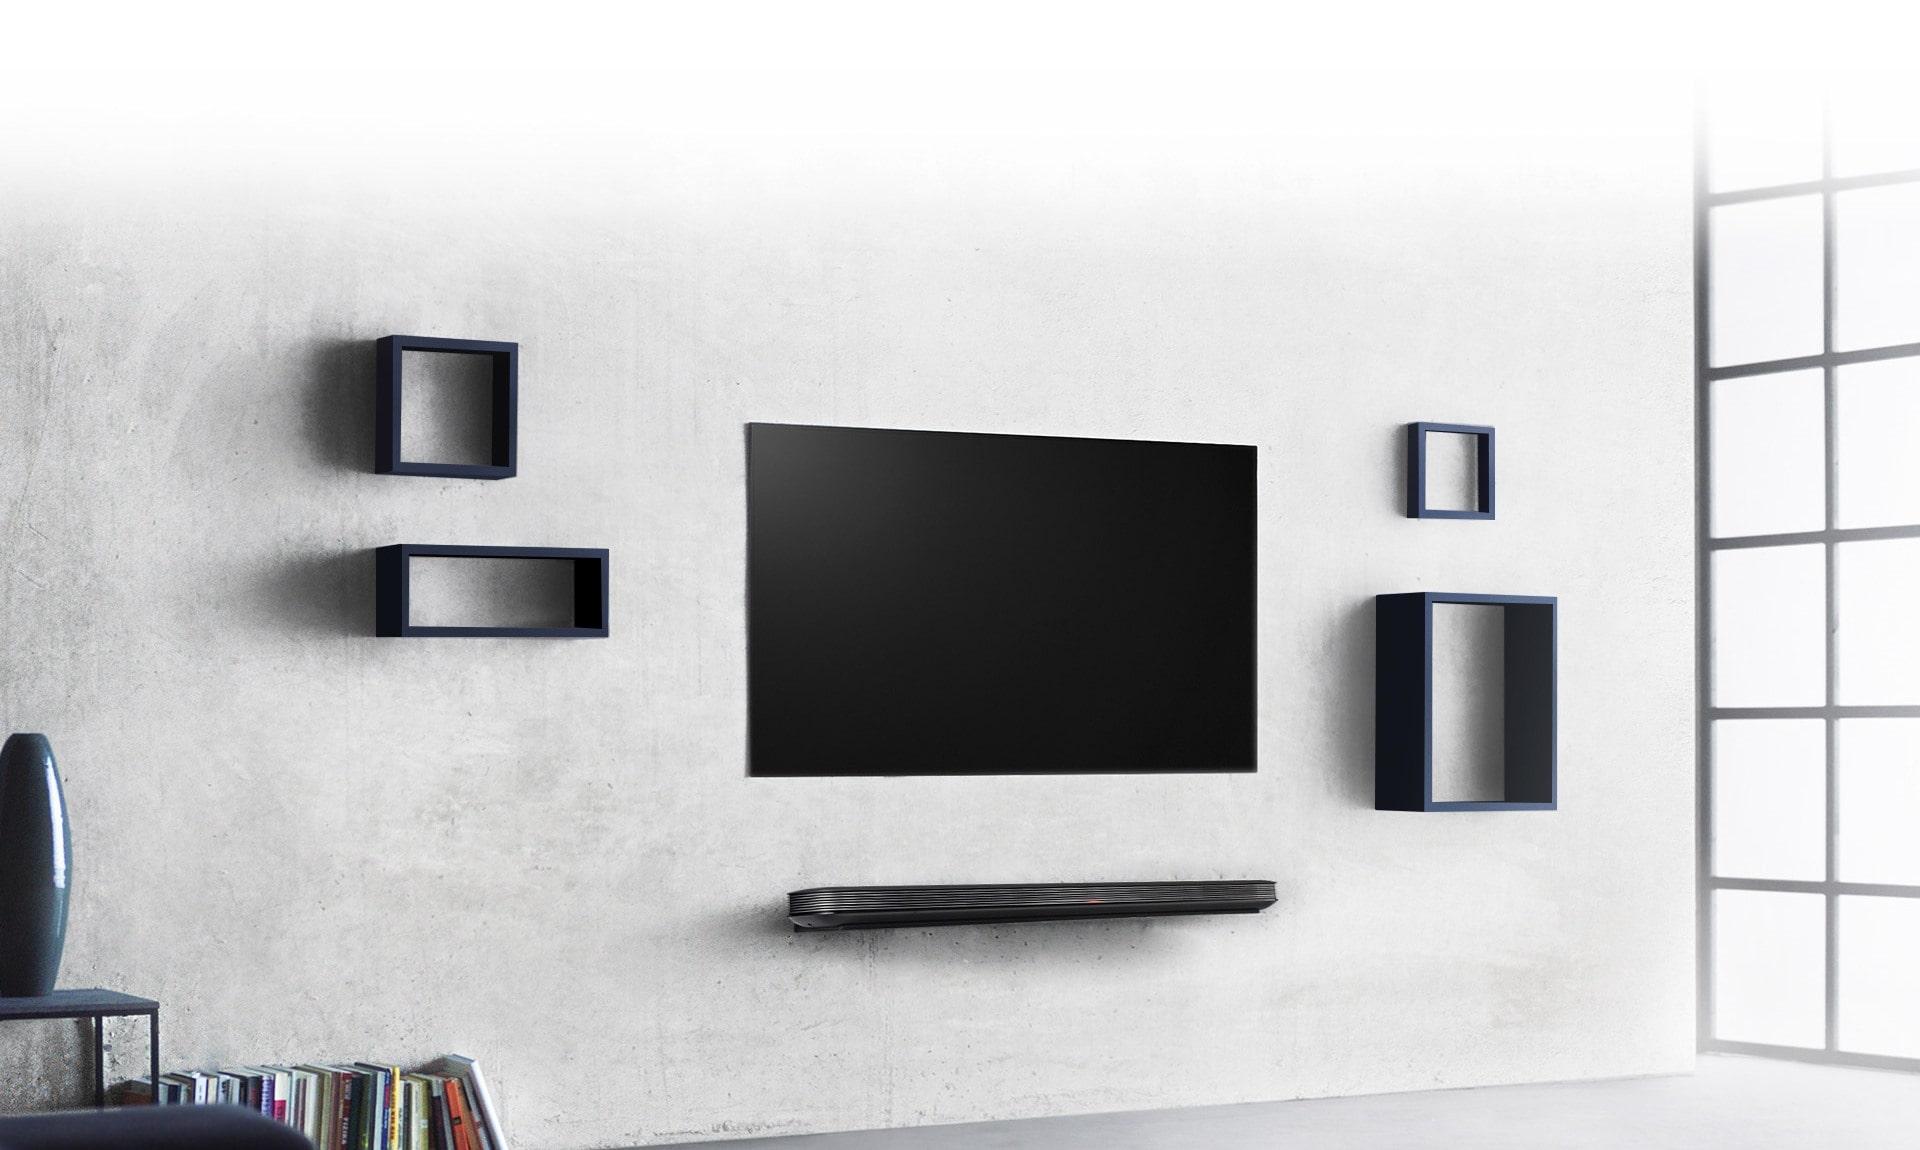 LG W7 OLED TV SIGNATURE Wallpaper 65 Inch Australia